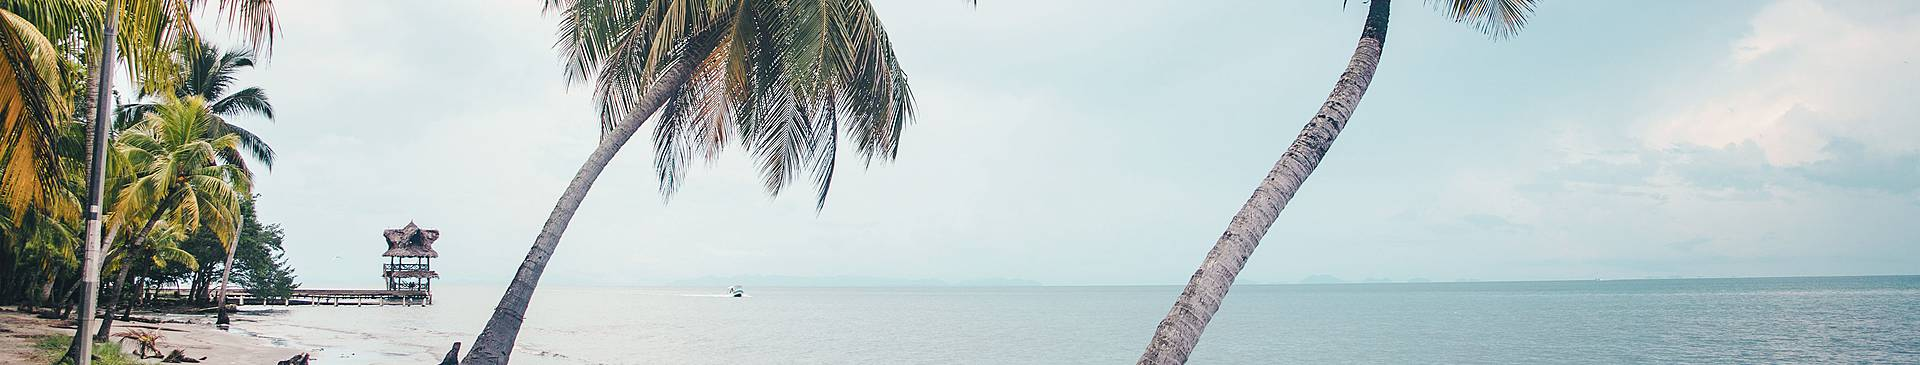 Beaches in Guatemala